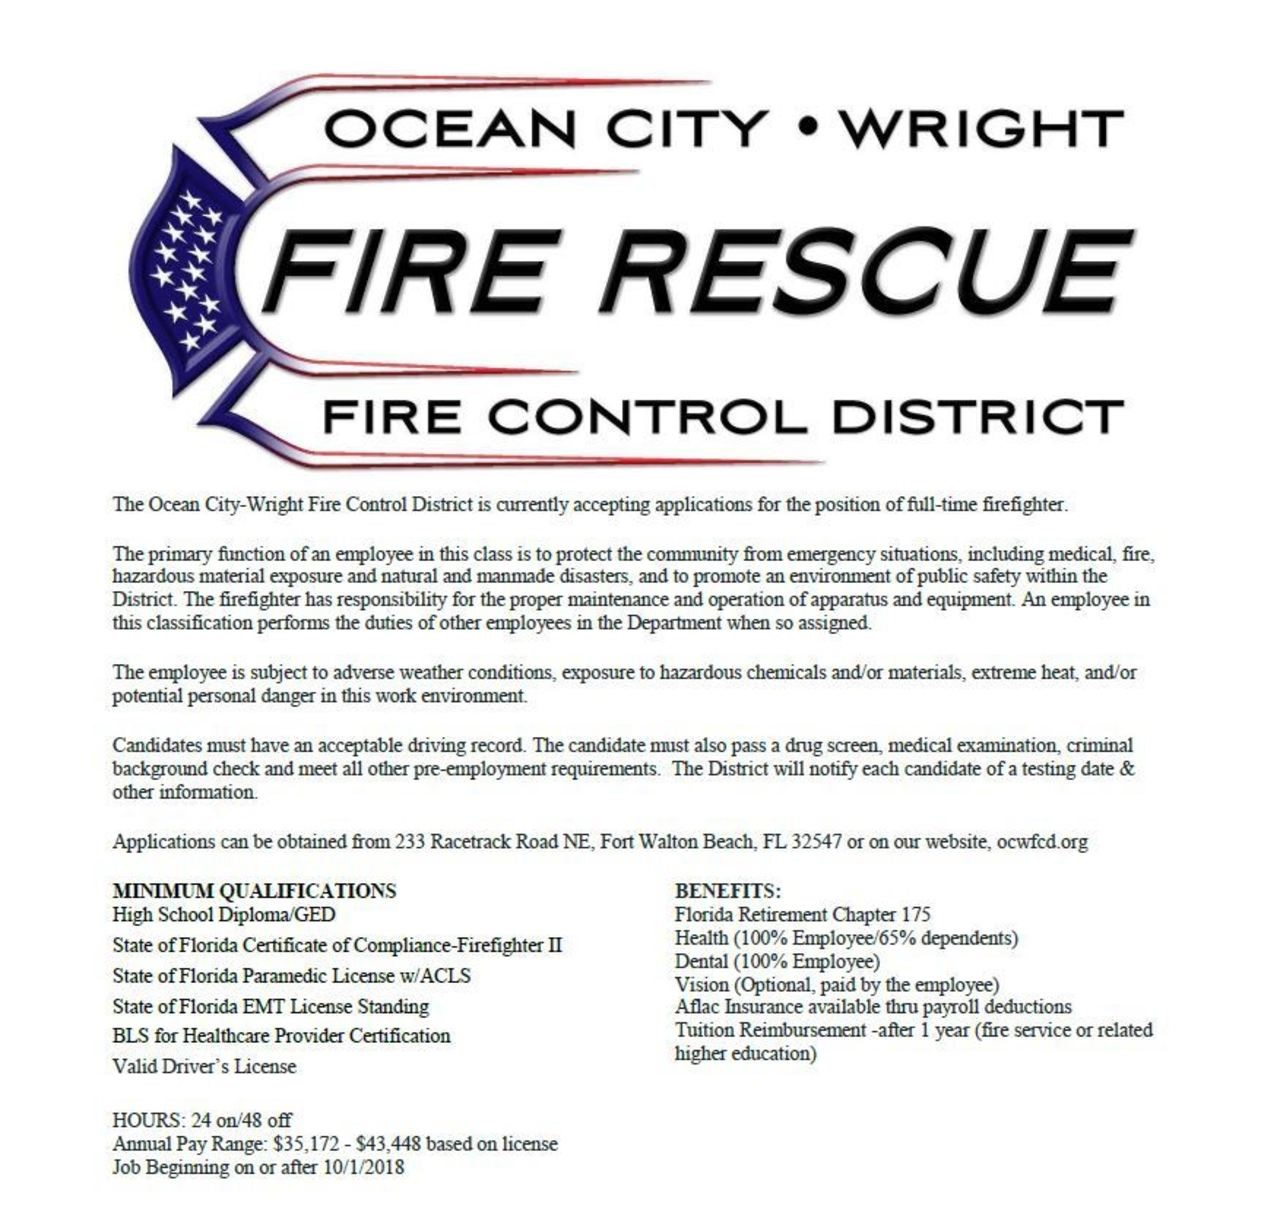 Ocean City – Wright Fire Rescue Hiring Firefighter